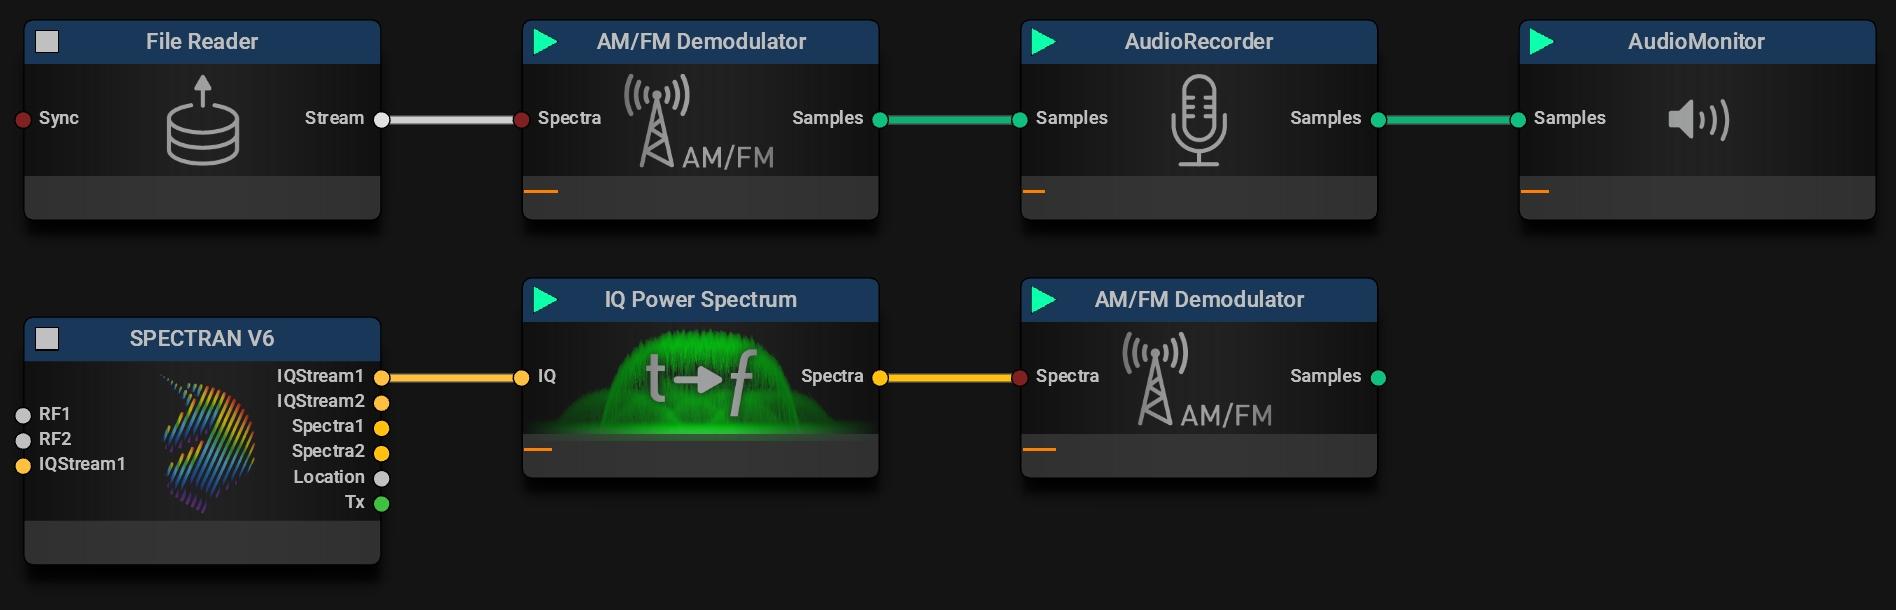 AM / FM Demodulator Typical Missions